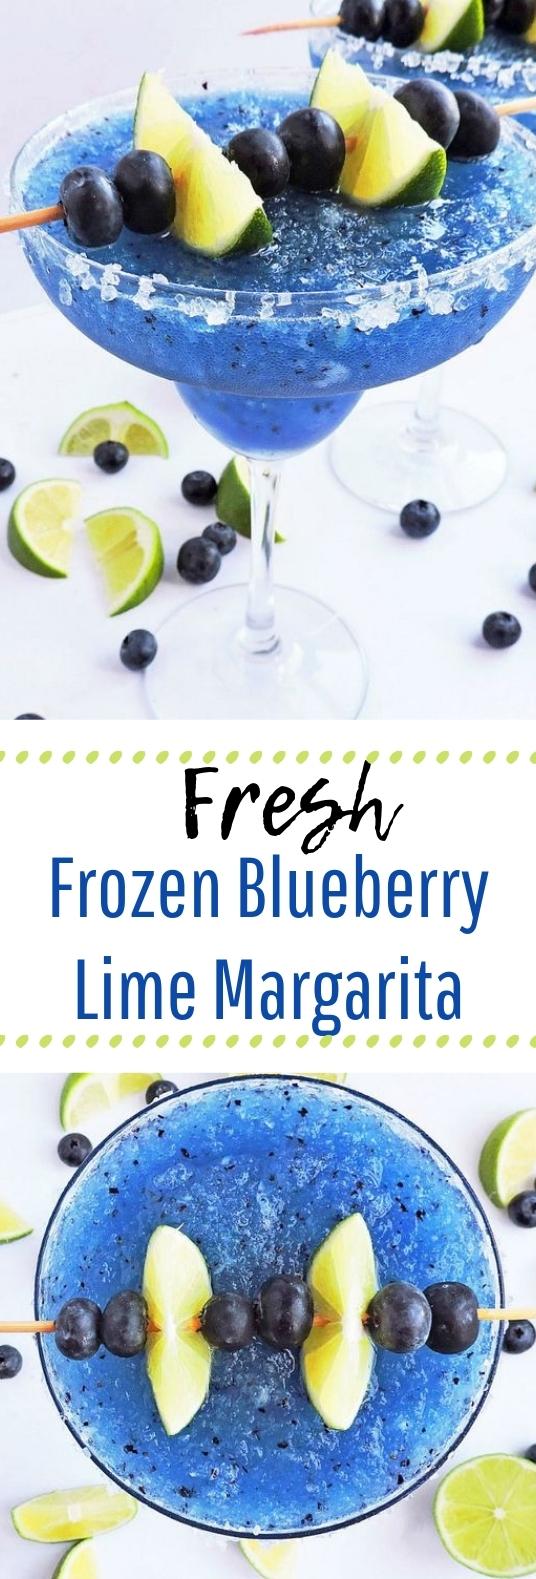 Fresh Frozen Blueberry Lime Margarita #deliciousdrink #drinks